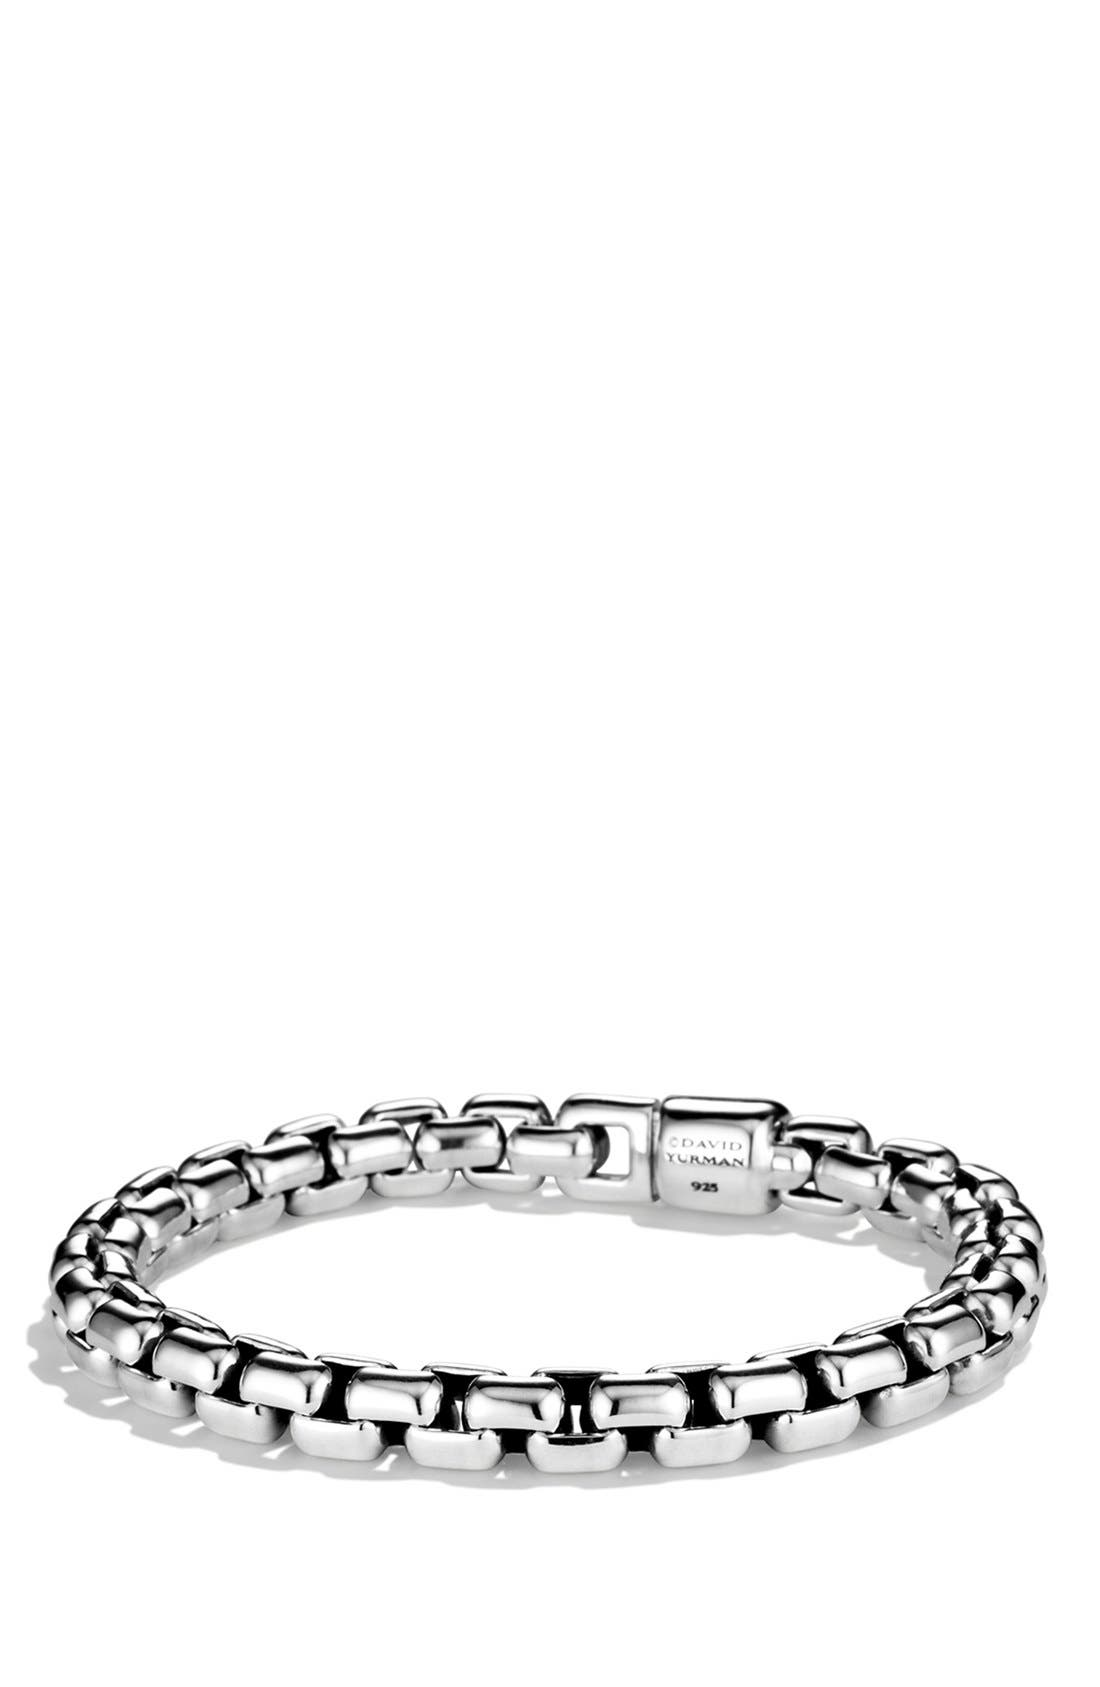 Alternate Image 1 Selected - David Yurman 'Chain' Box Chain Bracelet